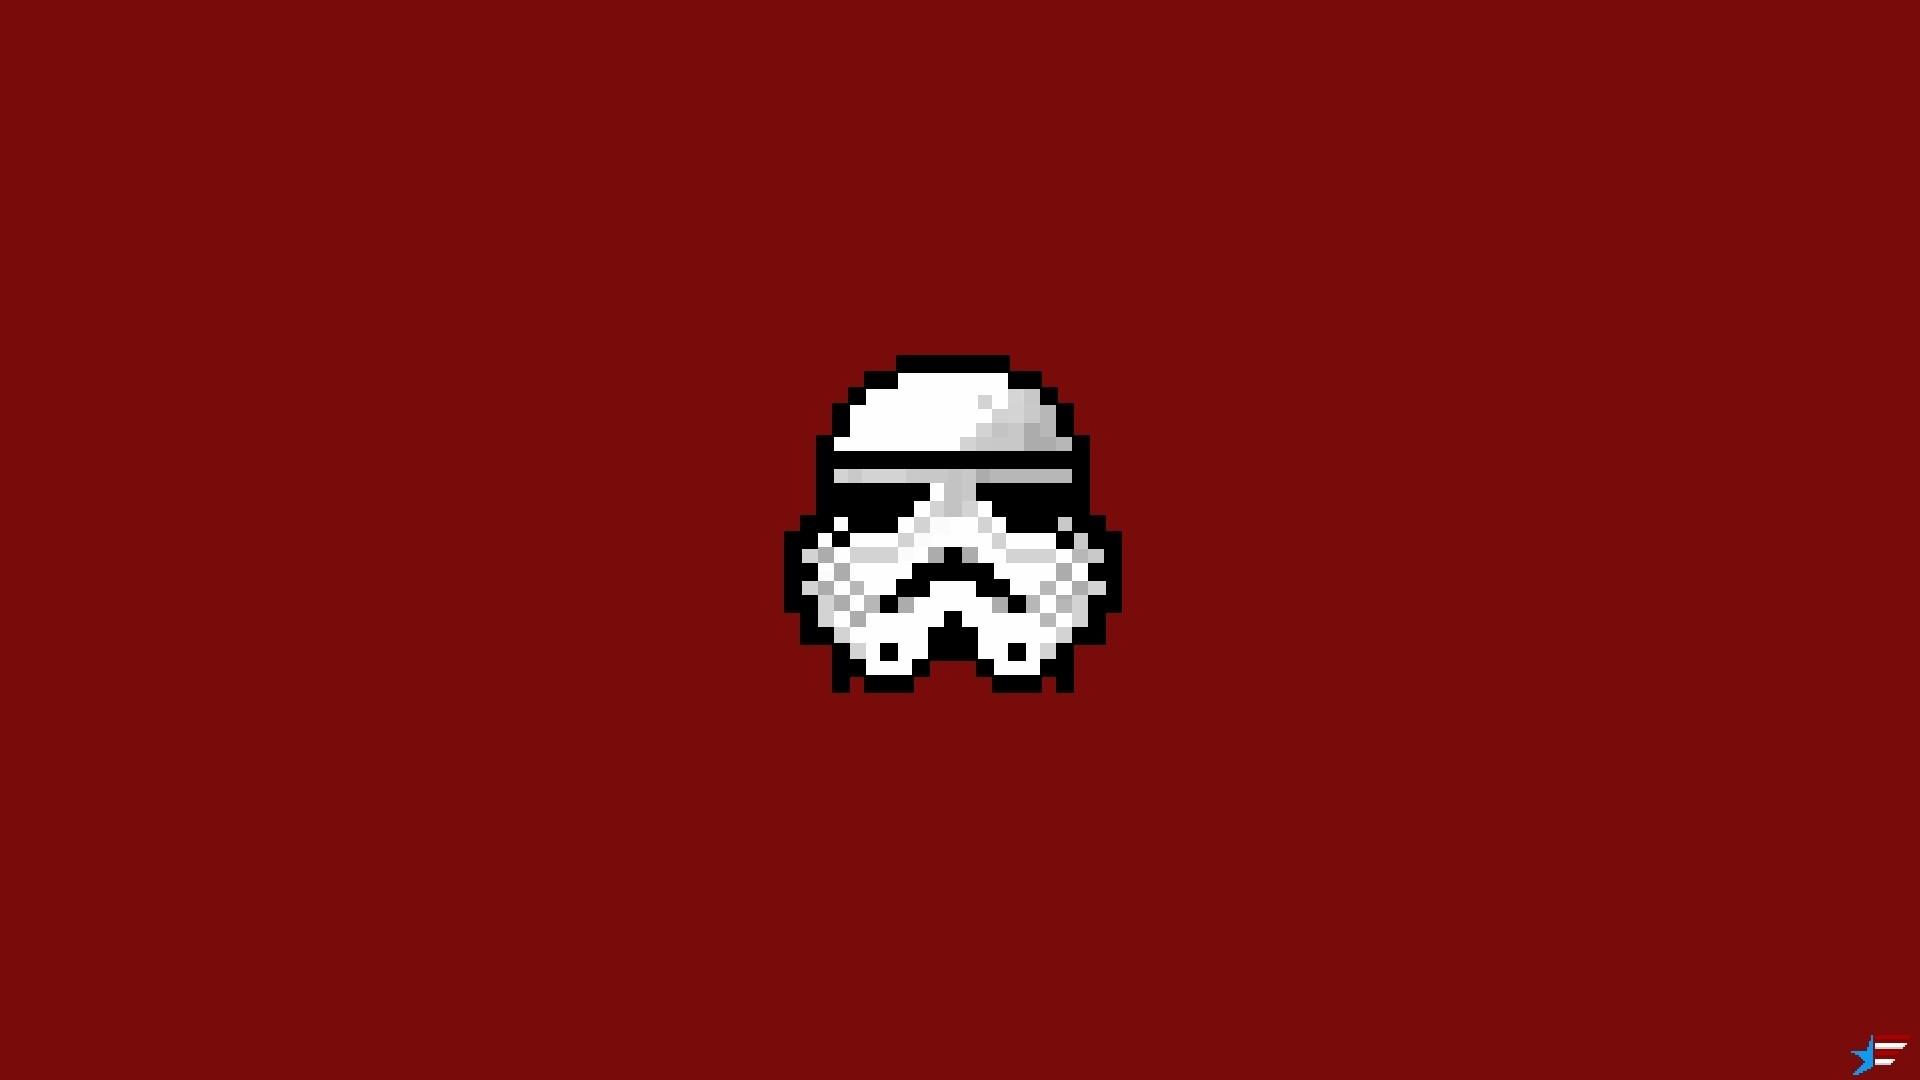 Wallpaper 8 bit, 8bit, pixelart, pixel art, stormtrooper, storm .